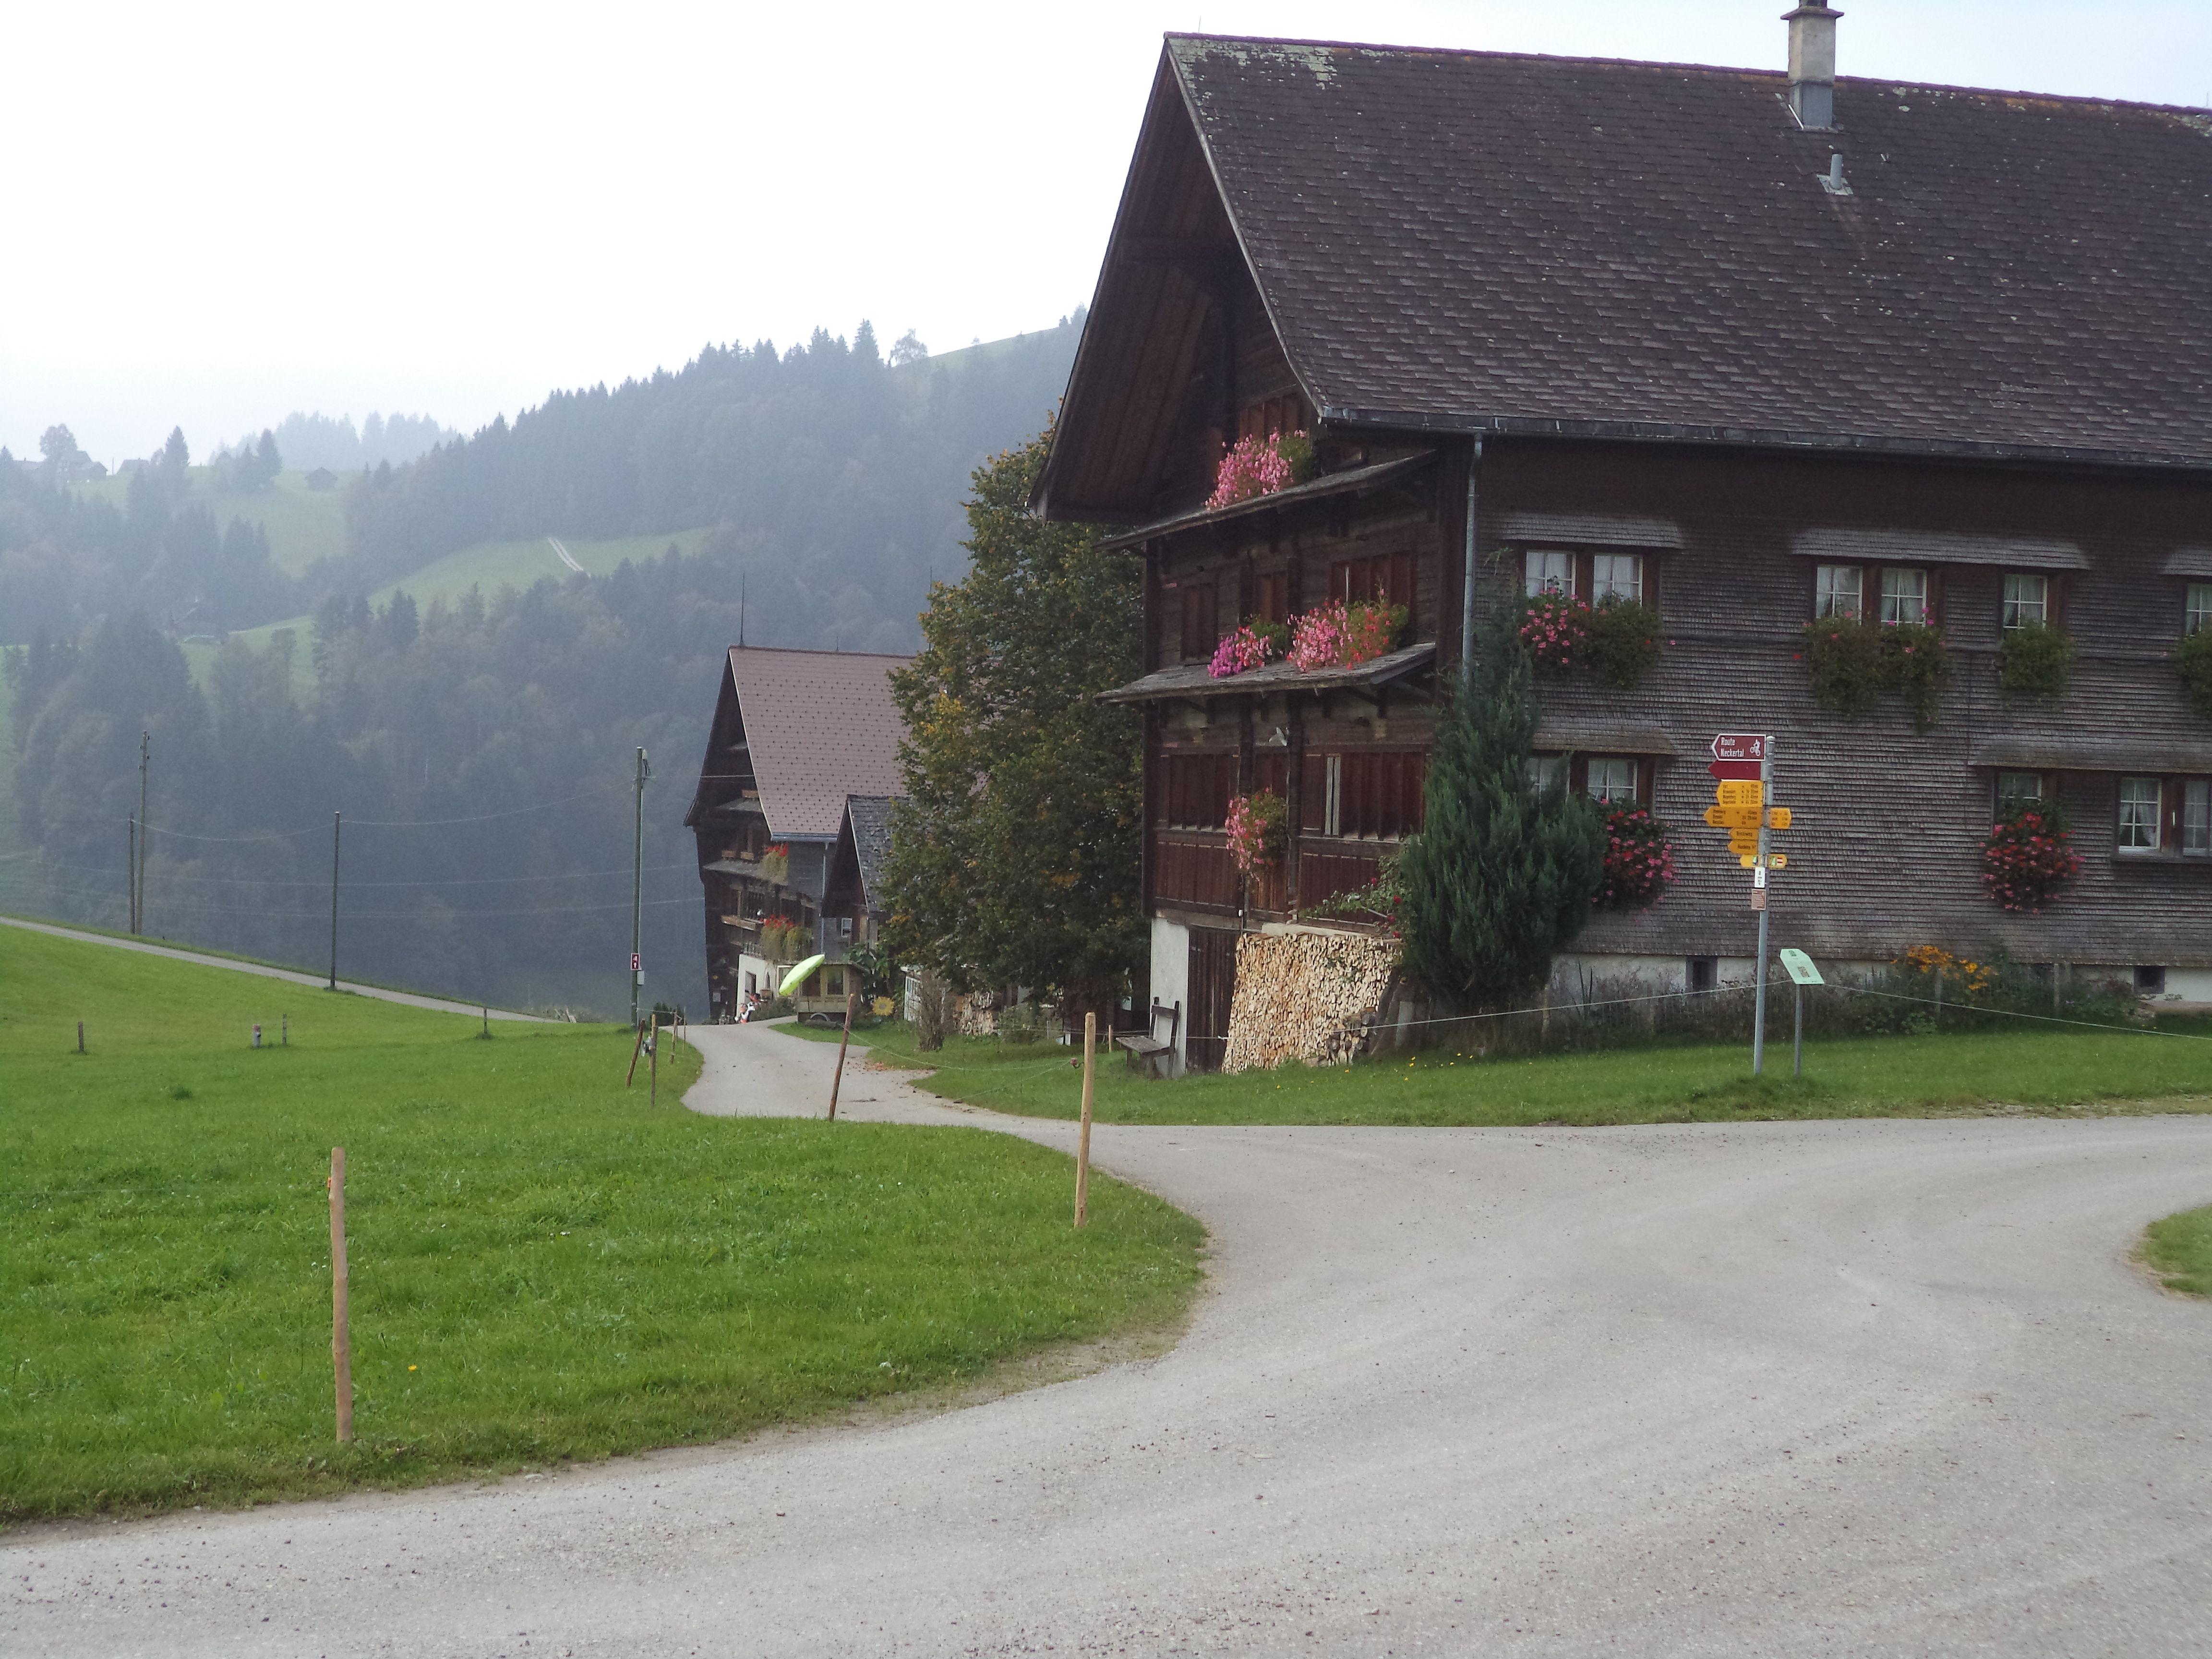 Etappe2 Herisau-Wattwil / malerisch Hofstetten